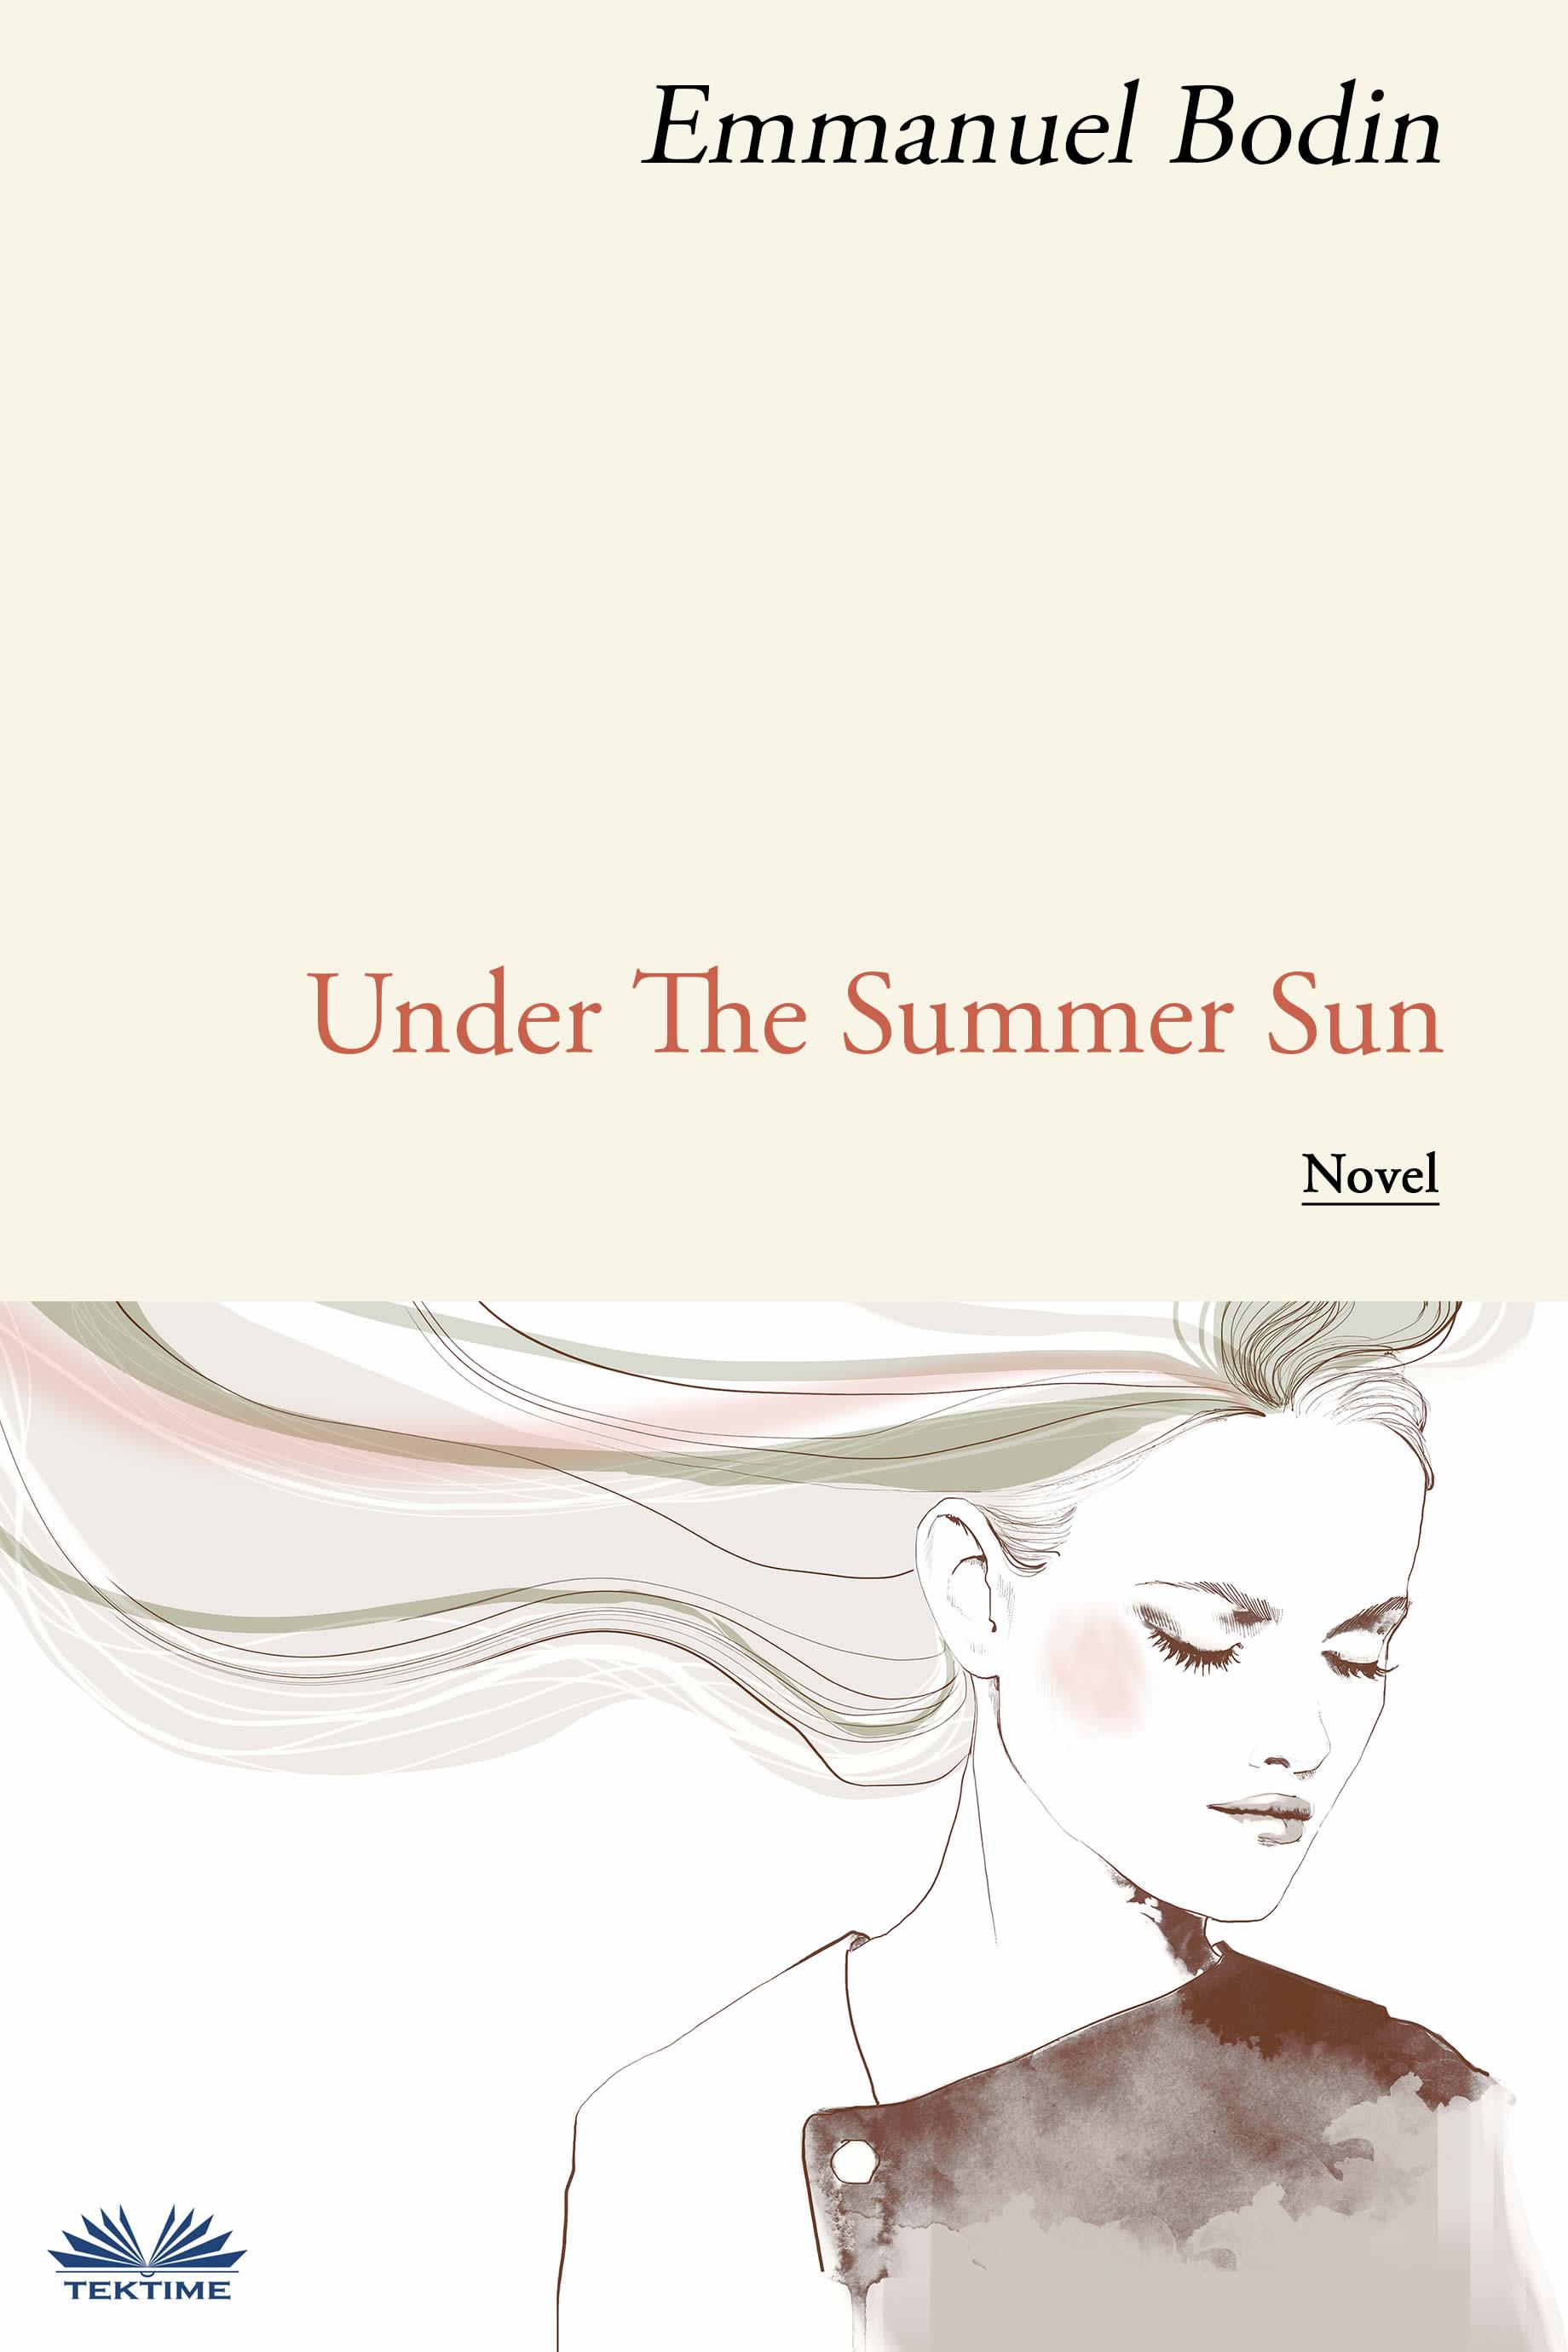 купить Emmanuel Bodin Under The Summer Sun